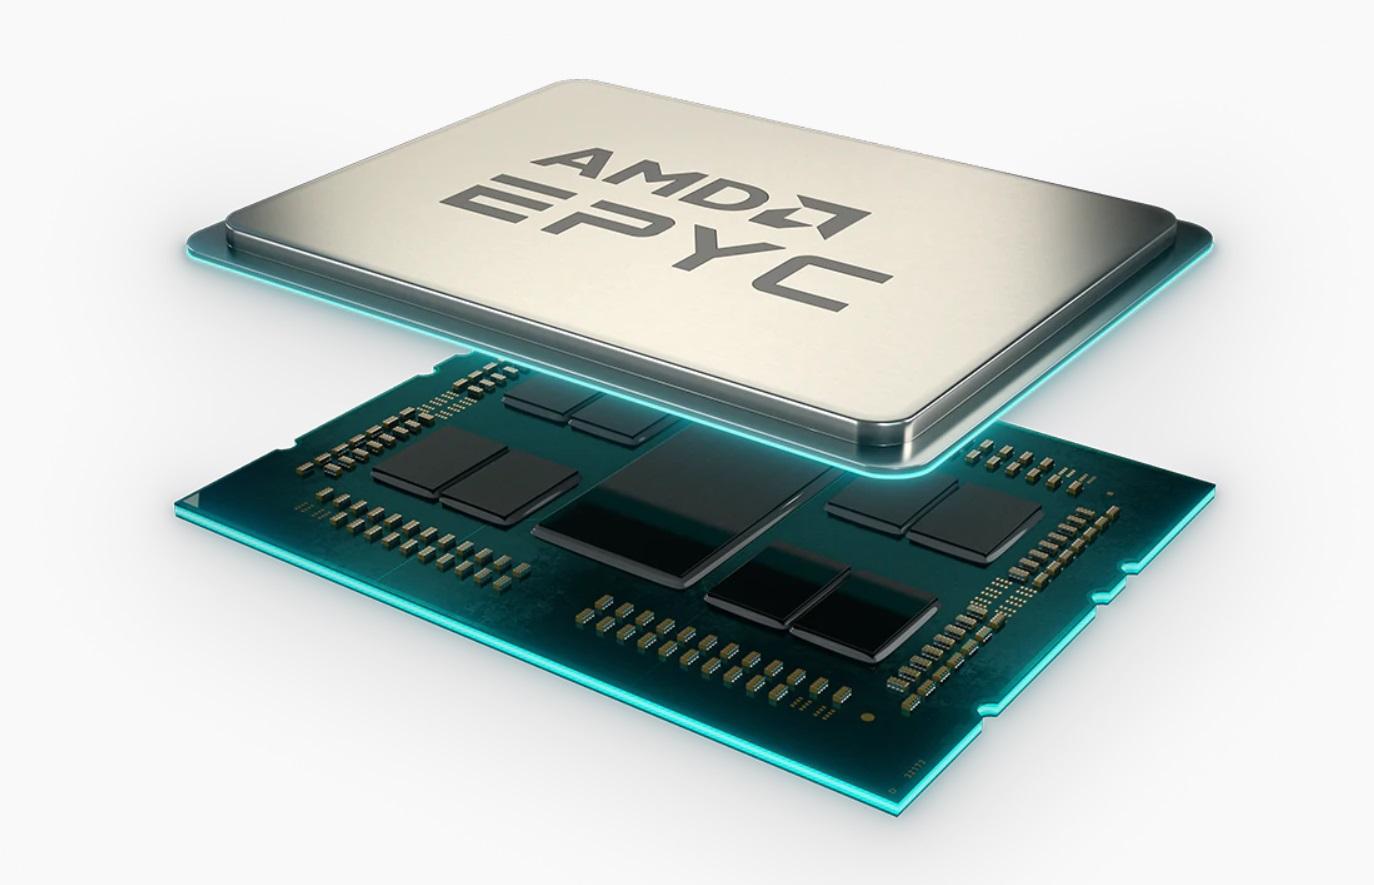 ? AMD EPYC 7763 64核Zen3架构处理器跑分曝光:不如48核前代产品 处理器跑分